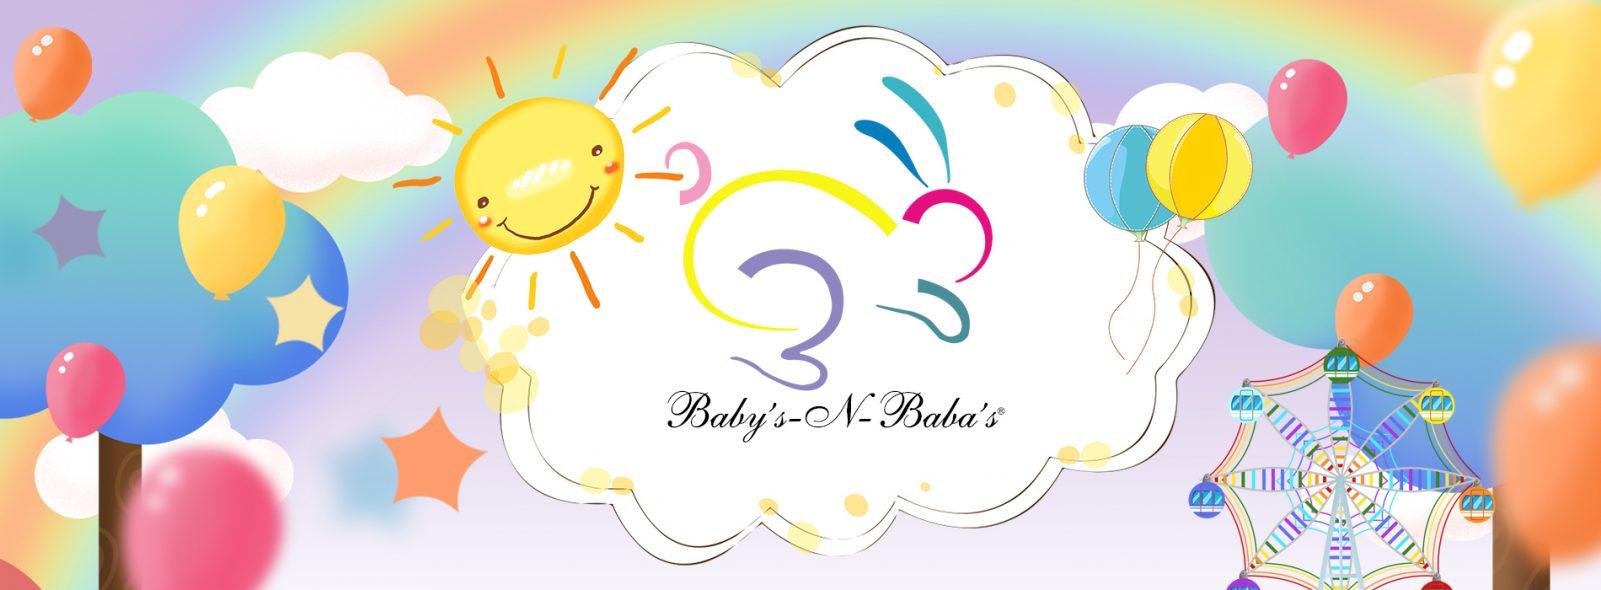 —Pngtree—children s day banner_1038067